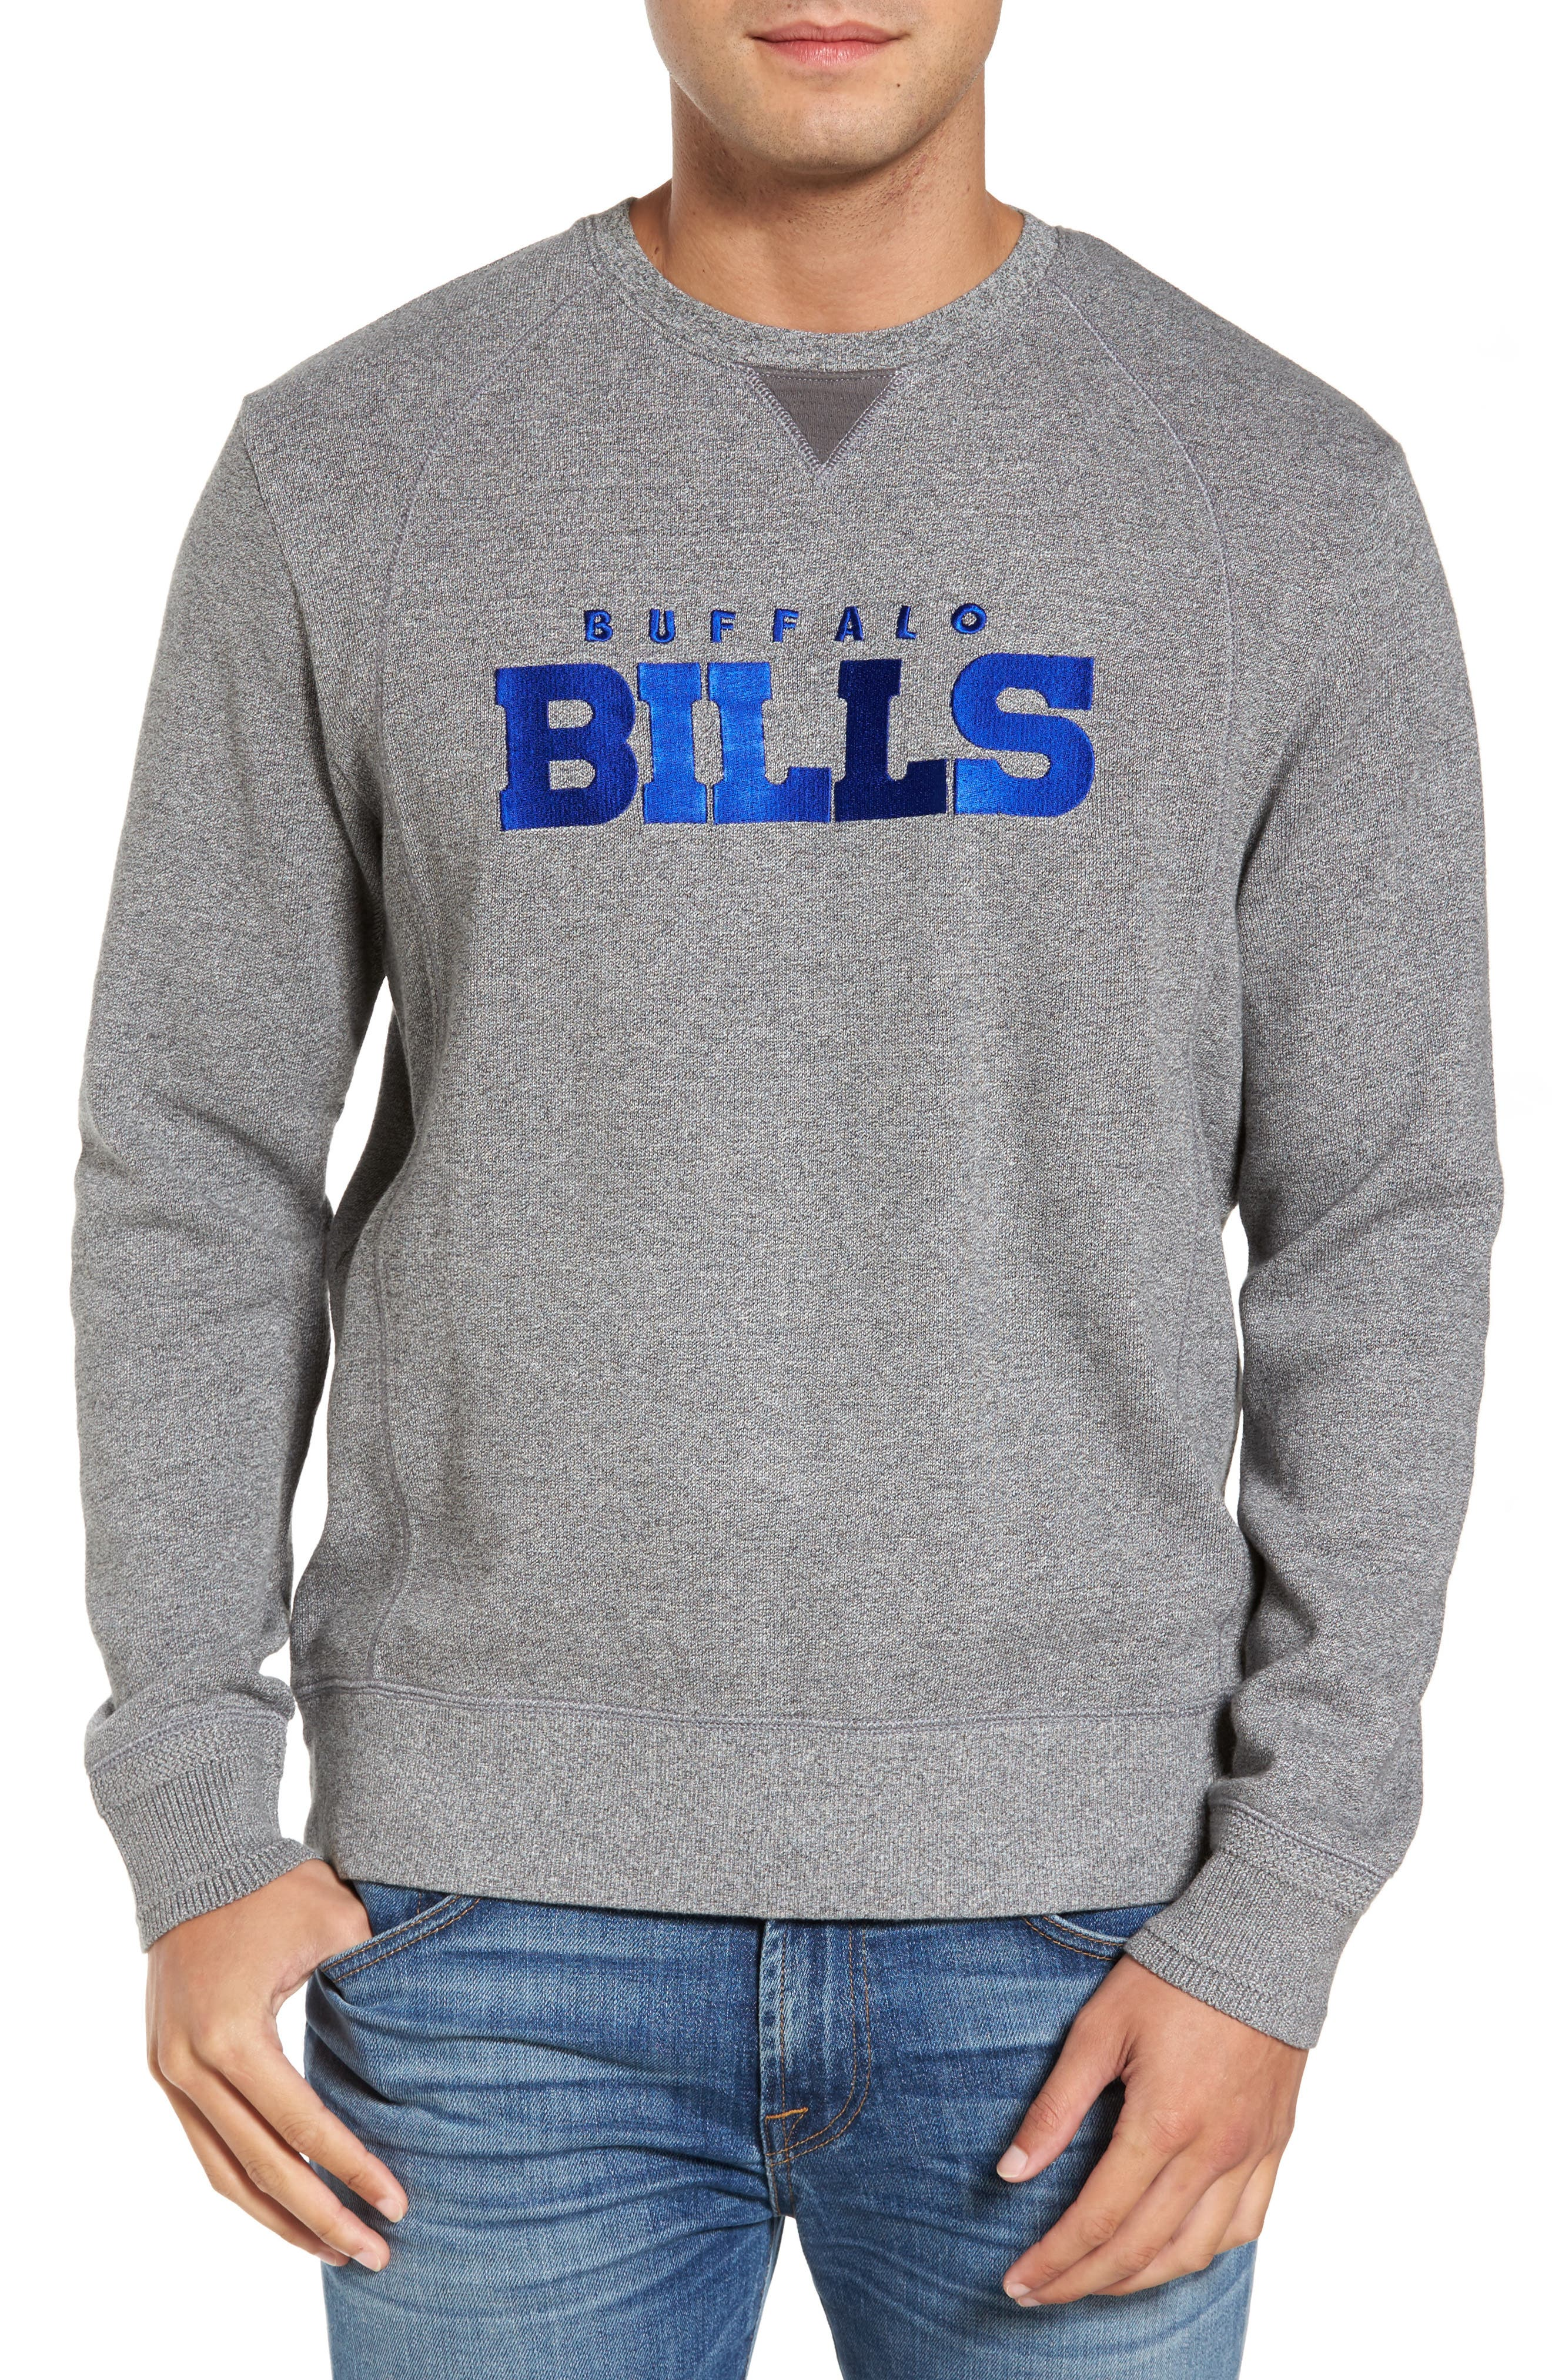 NFL Stitch of Liberty Embroidered Crewneck Sweatshirt,                             Main thumbnail 5, color,